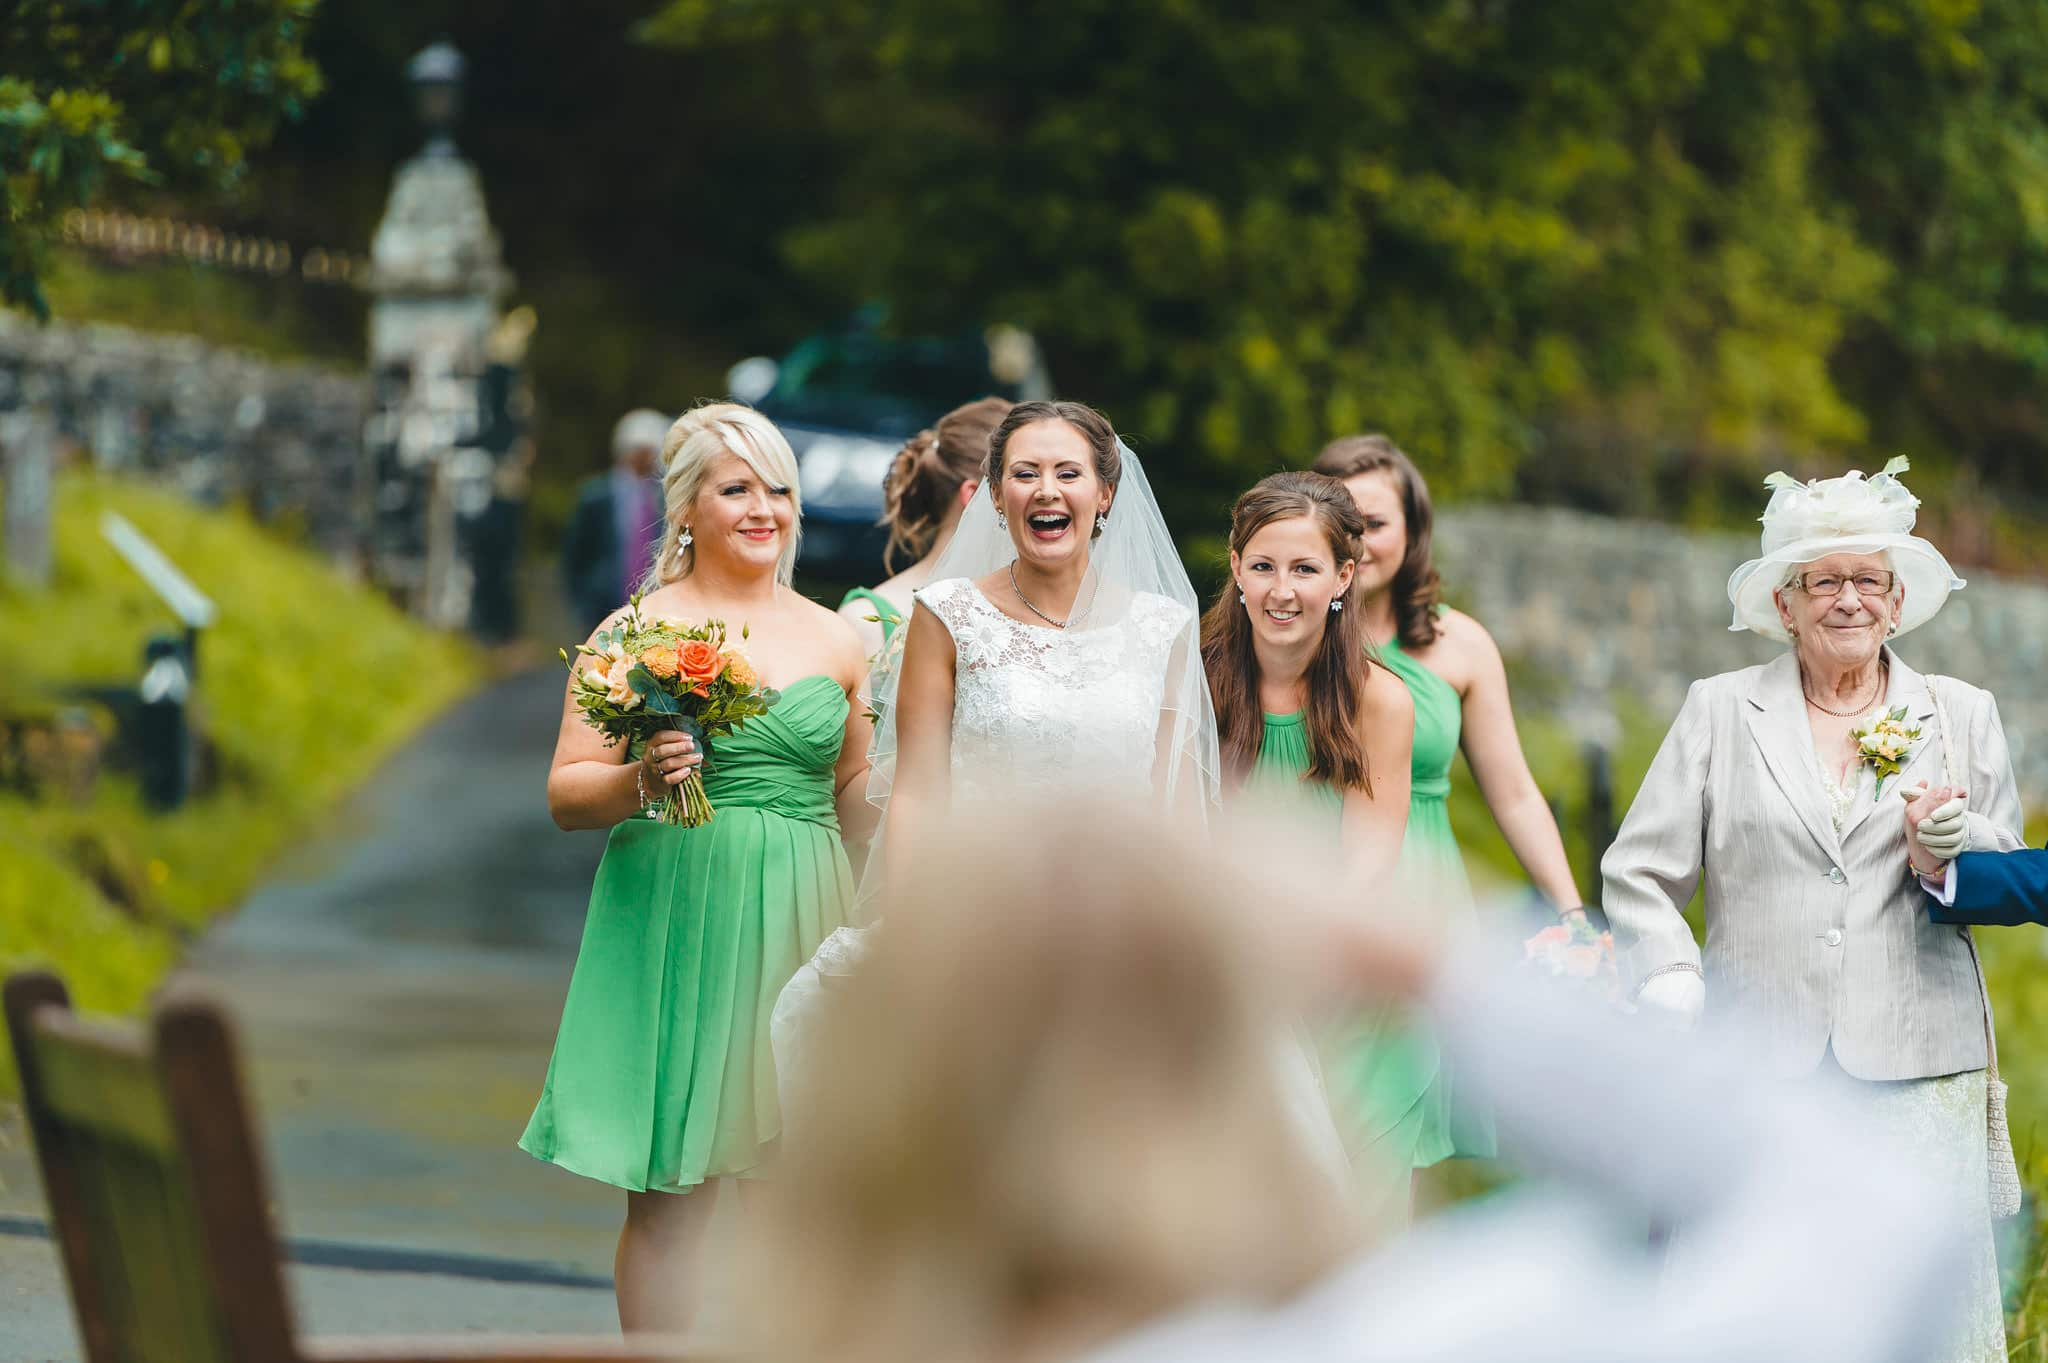 Wedding photography at Y Talbot Hotel in Tregaron, Wales   Tina + Phil 16